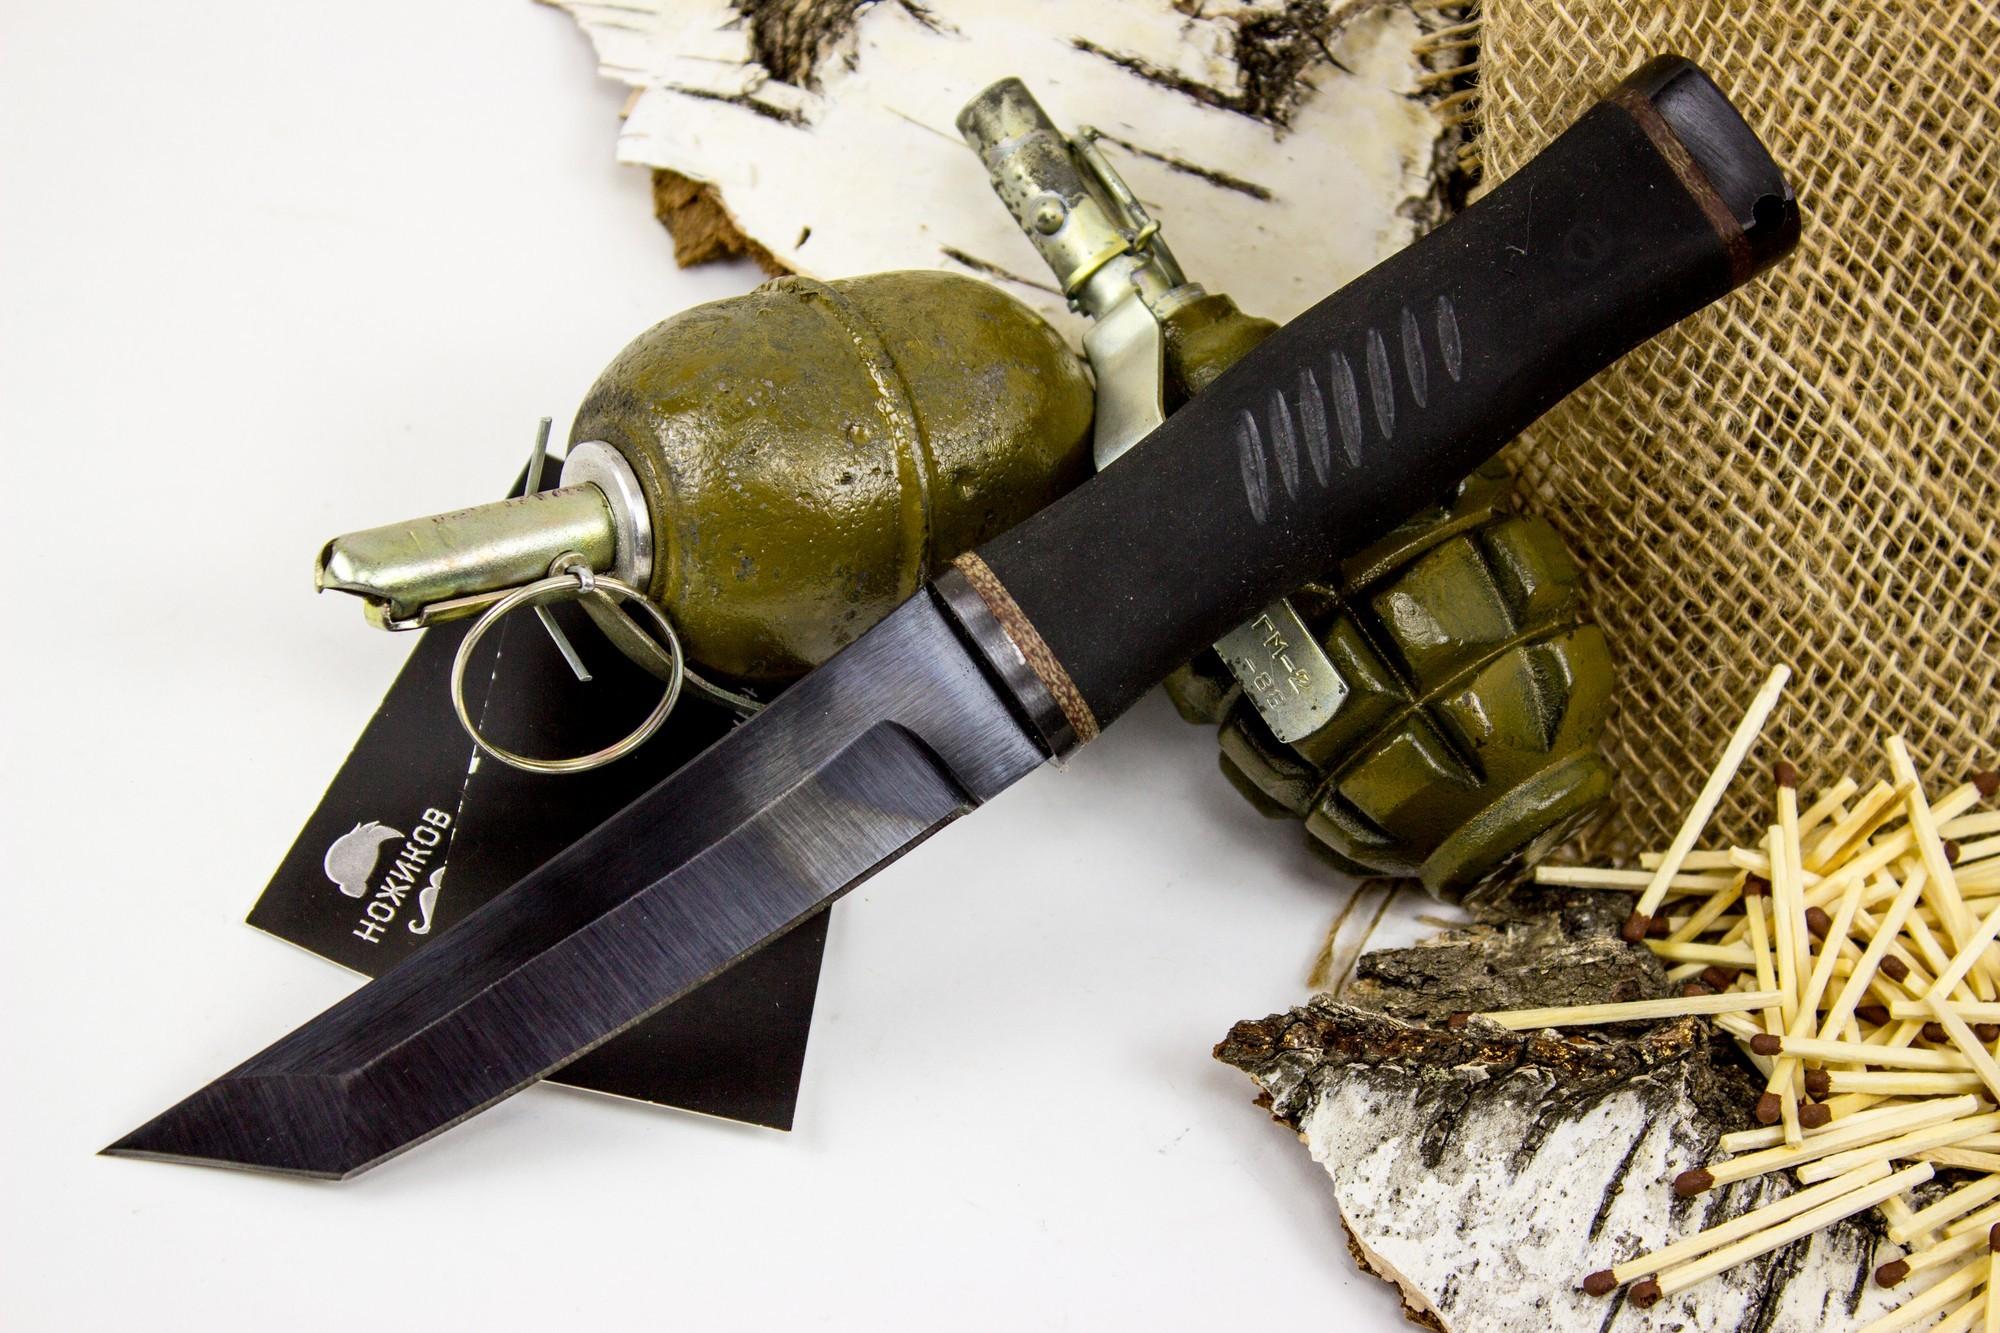 Нож Кабан-1М, сталь 65Г, резина Титов и Солдатова